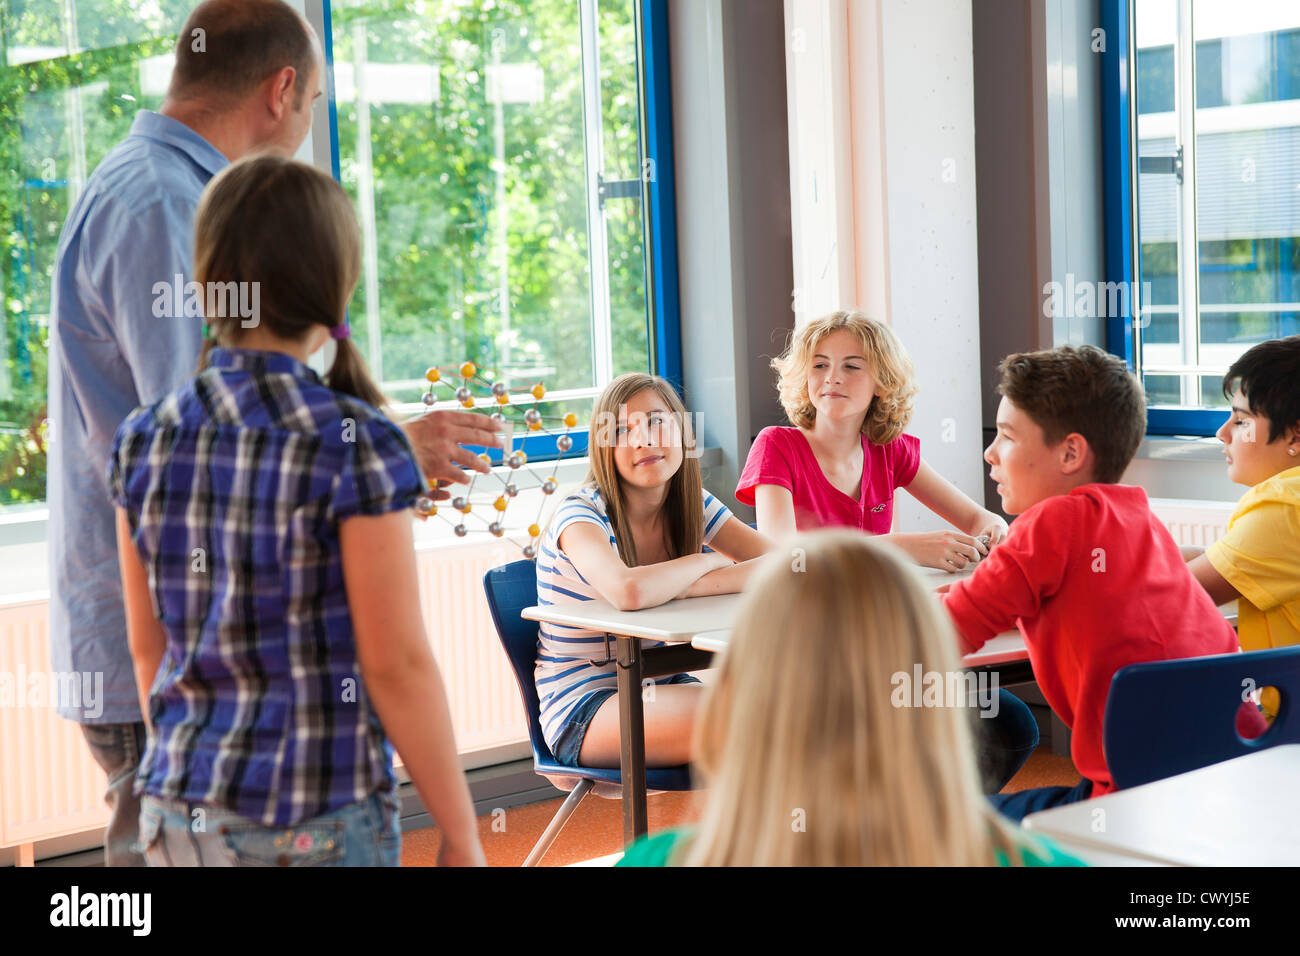 Teacher with molecular model in class - Stock Image